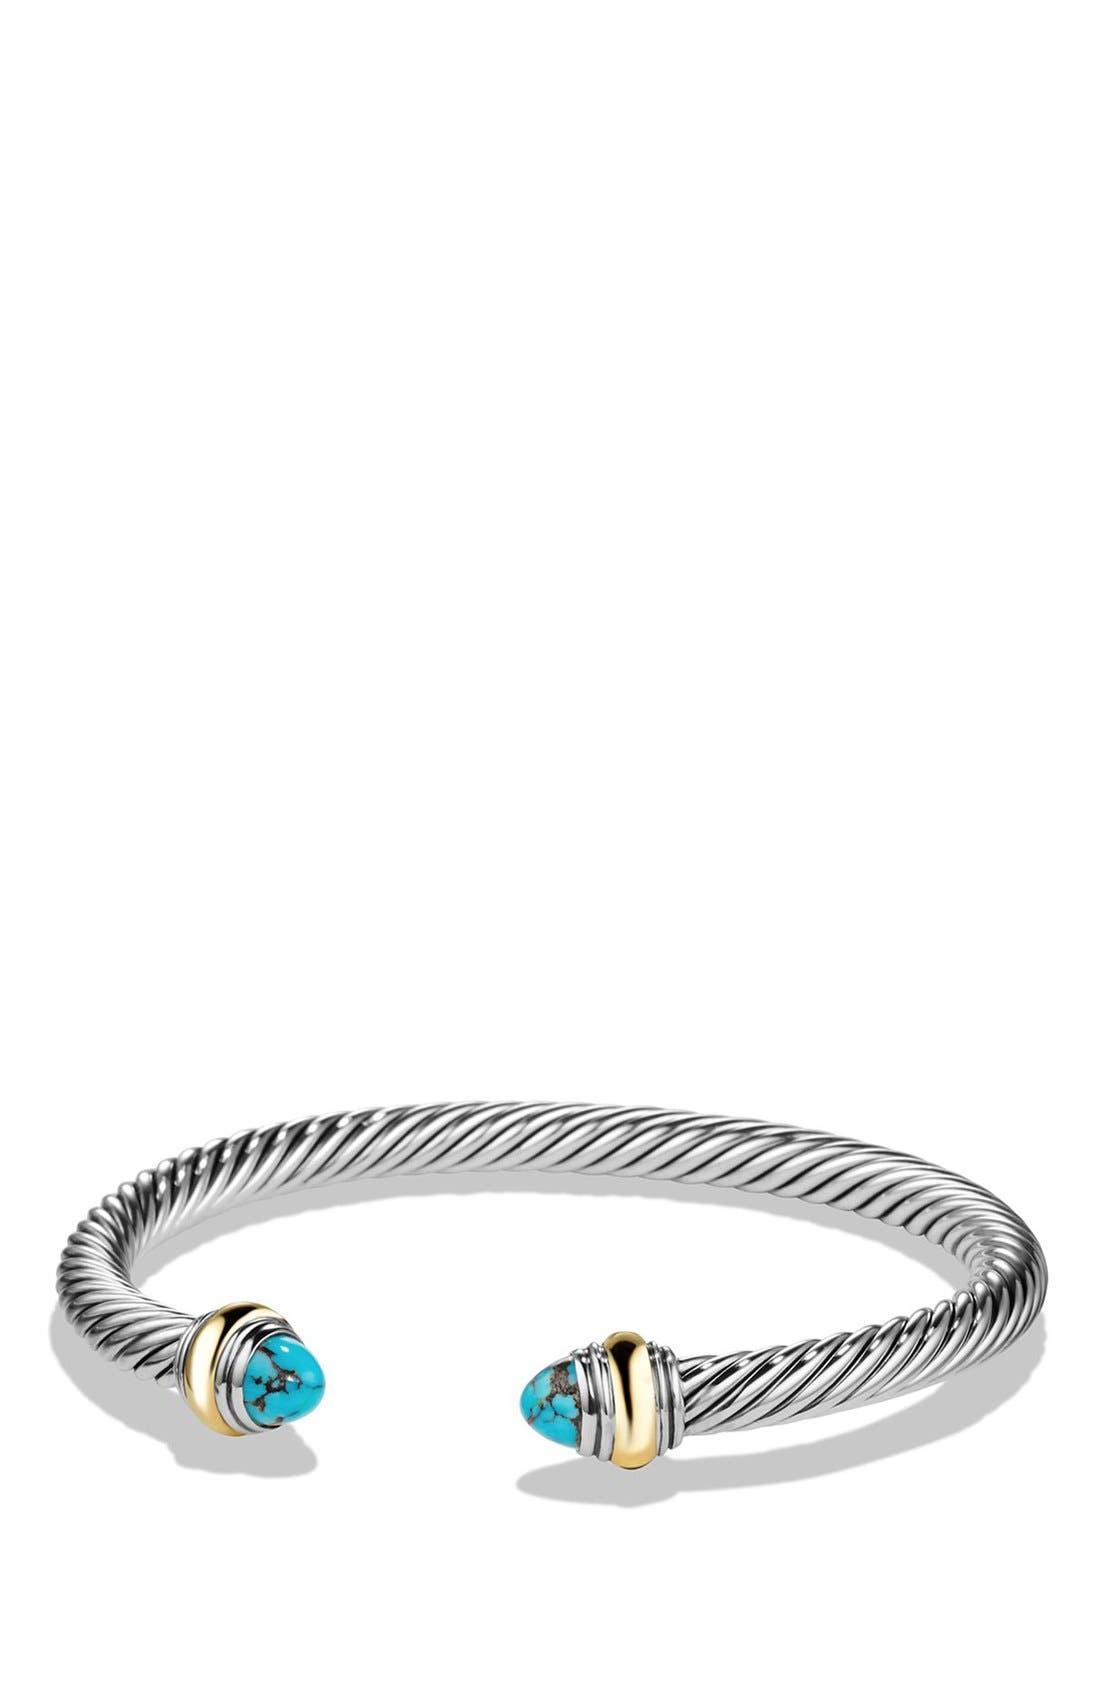 David Yurman Cable Classics Bracelet with Semiprecious Stones & 14K Gold Accent, 5mm